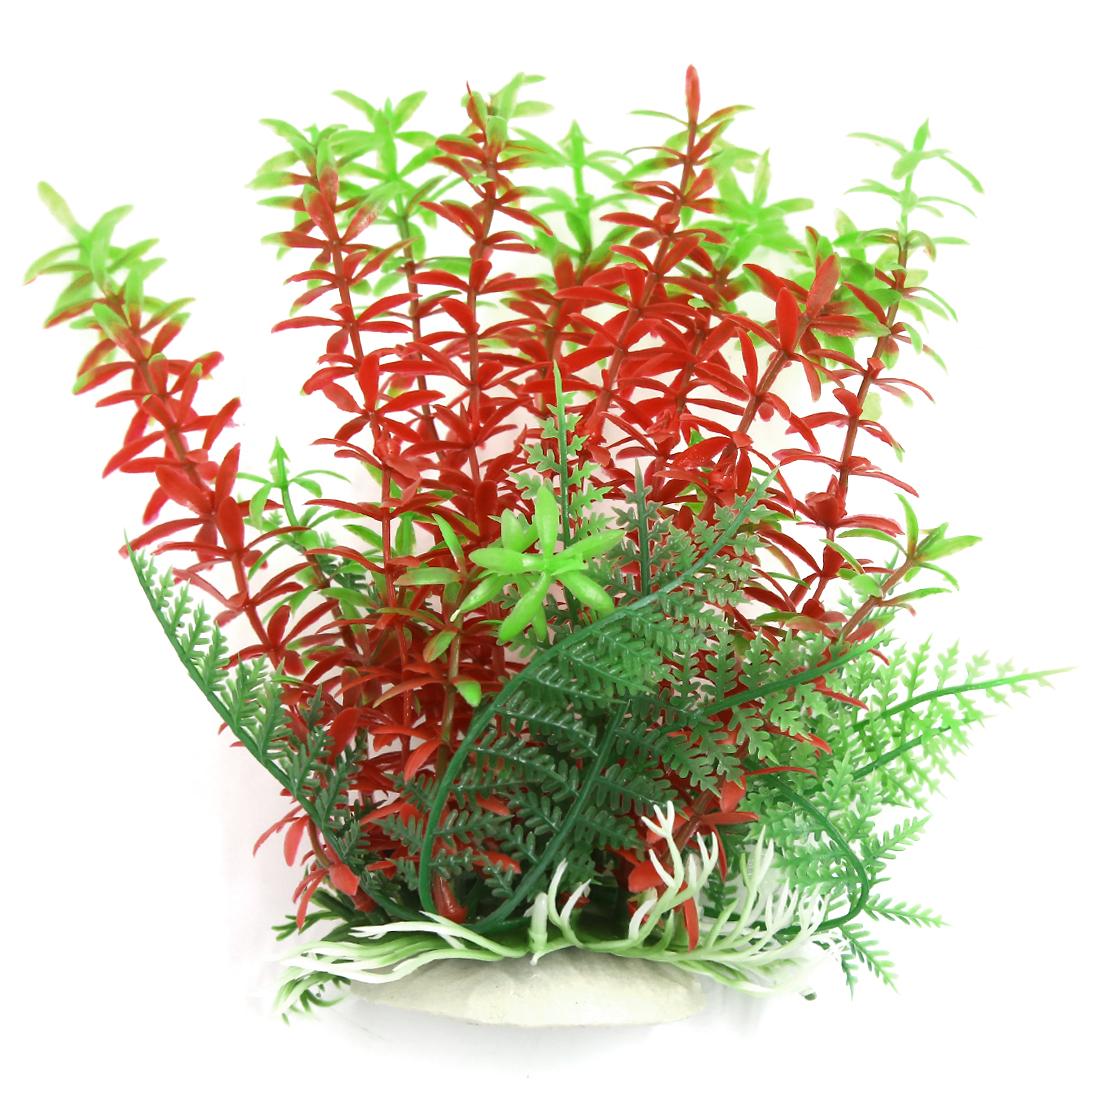 Aqua Landscape Fish Tank Decoration Red Green Plastic Plant for Betta 17cm